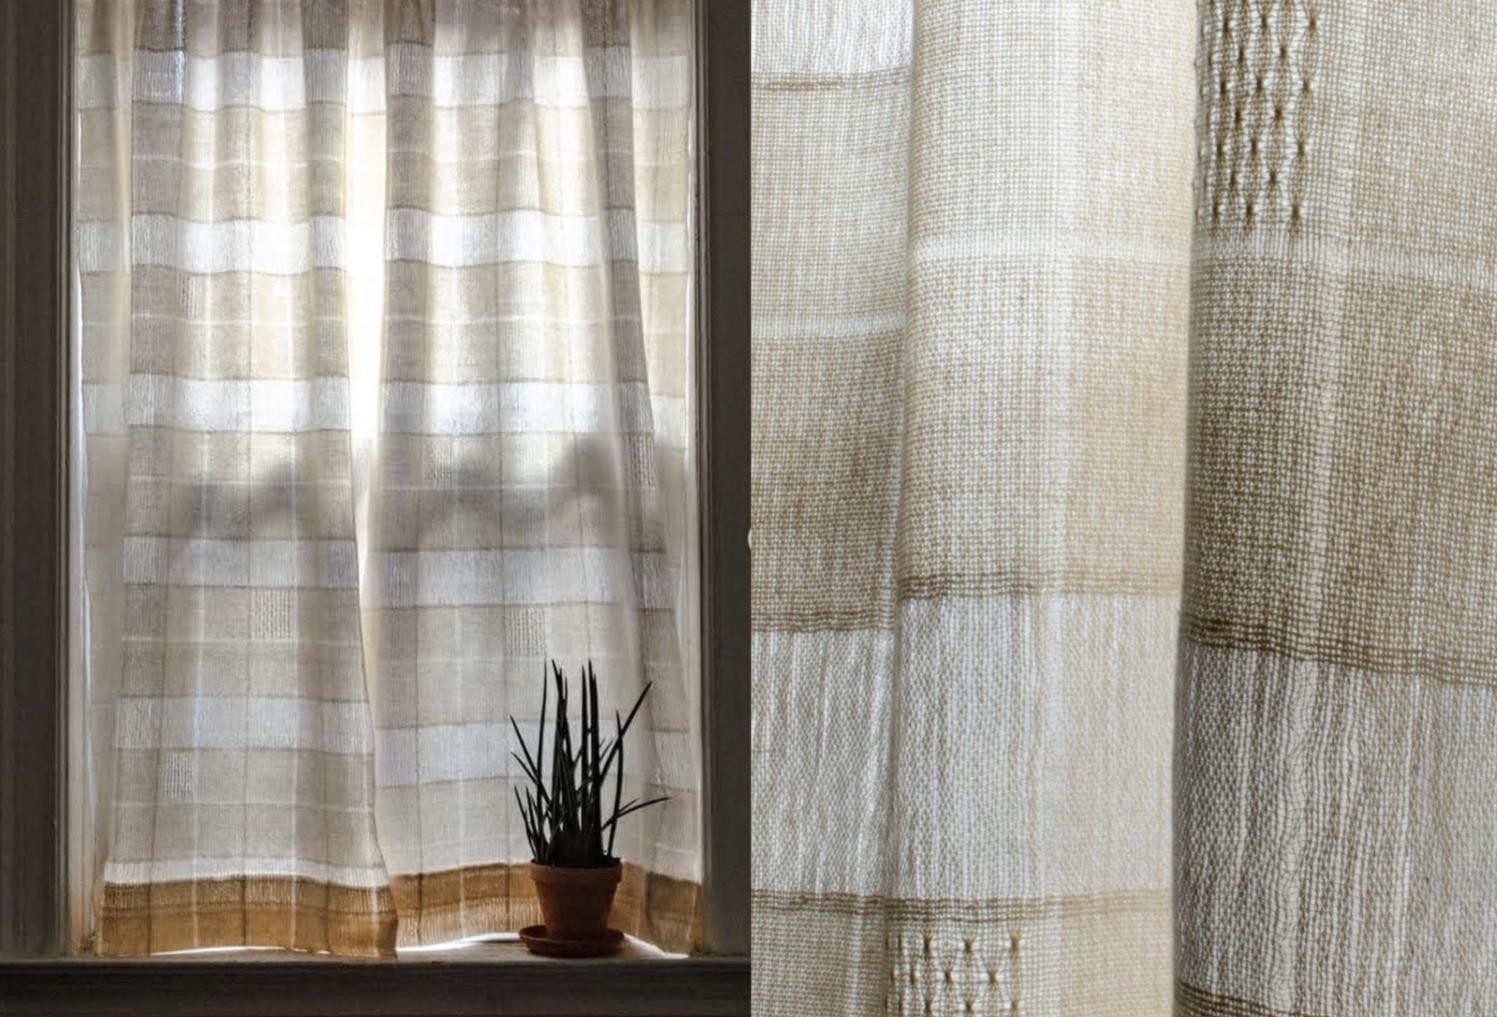 PaperPhine - Erin Supinski - Weaving Brook Bouquet Curtains